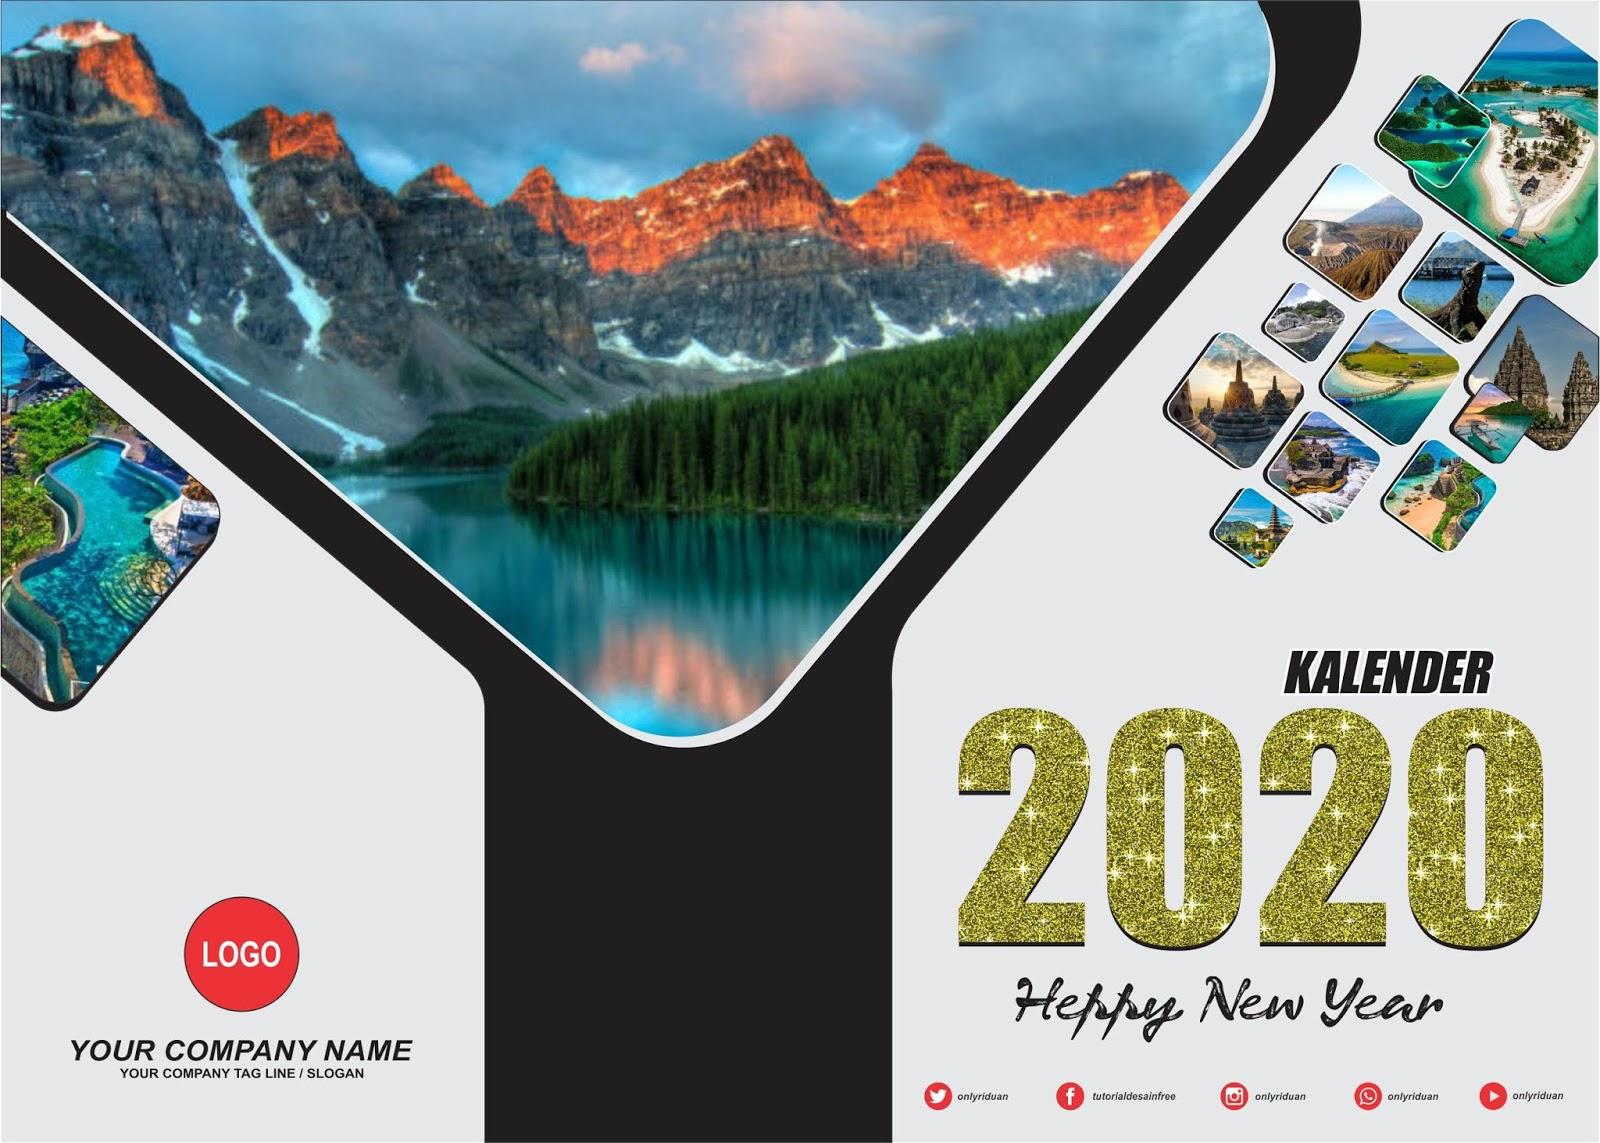 Desain Kalender Duduk 2020 dengan CorelDraw - TUTORiduan.com